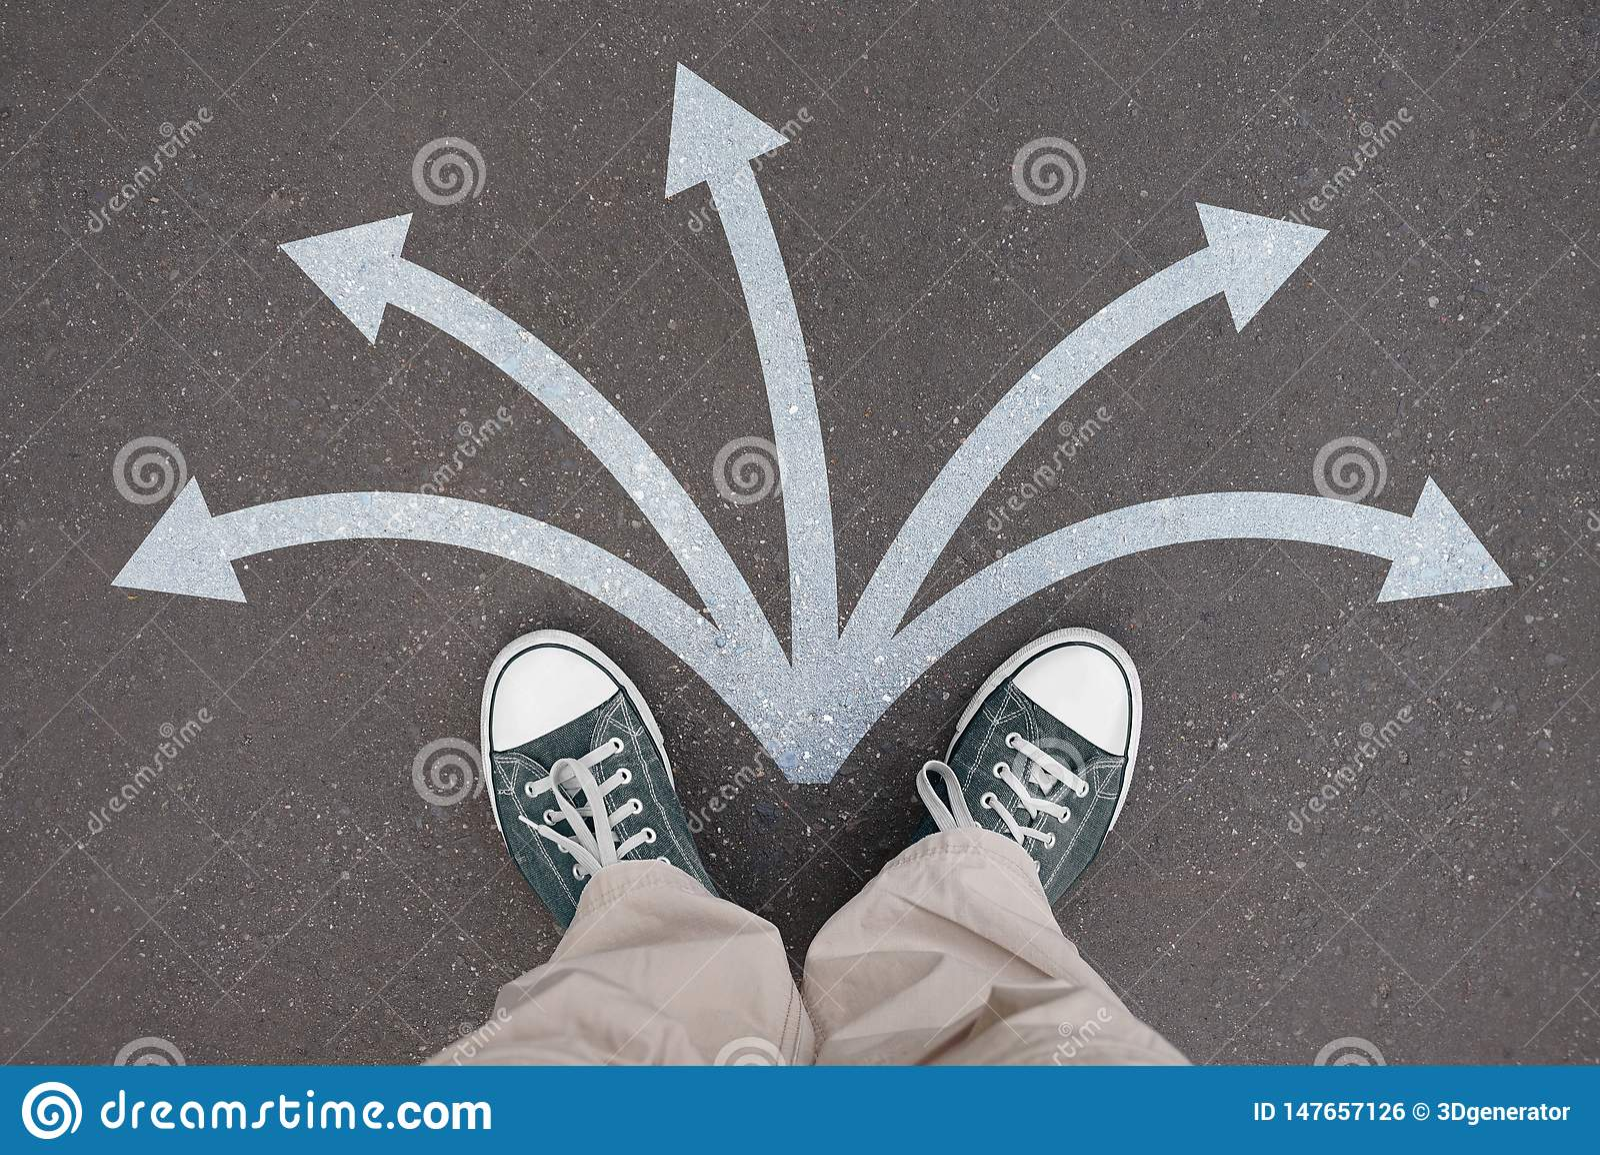 Shoes, trainers - five arrows, crossroads